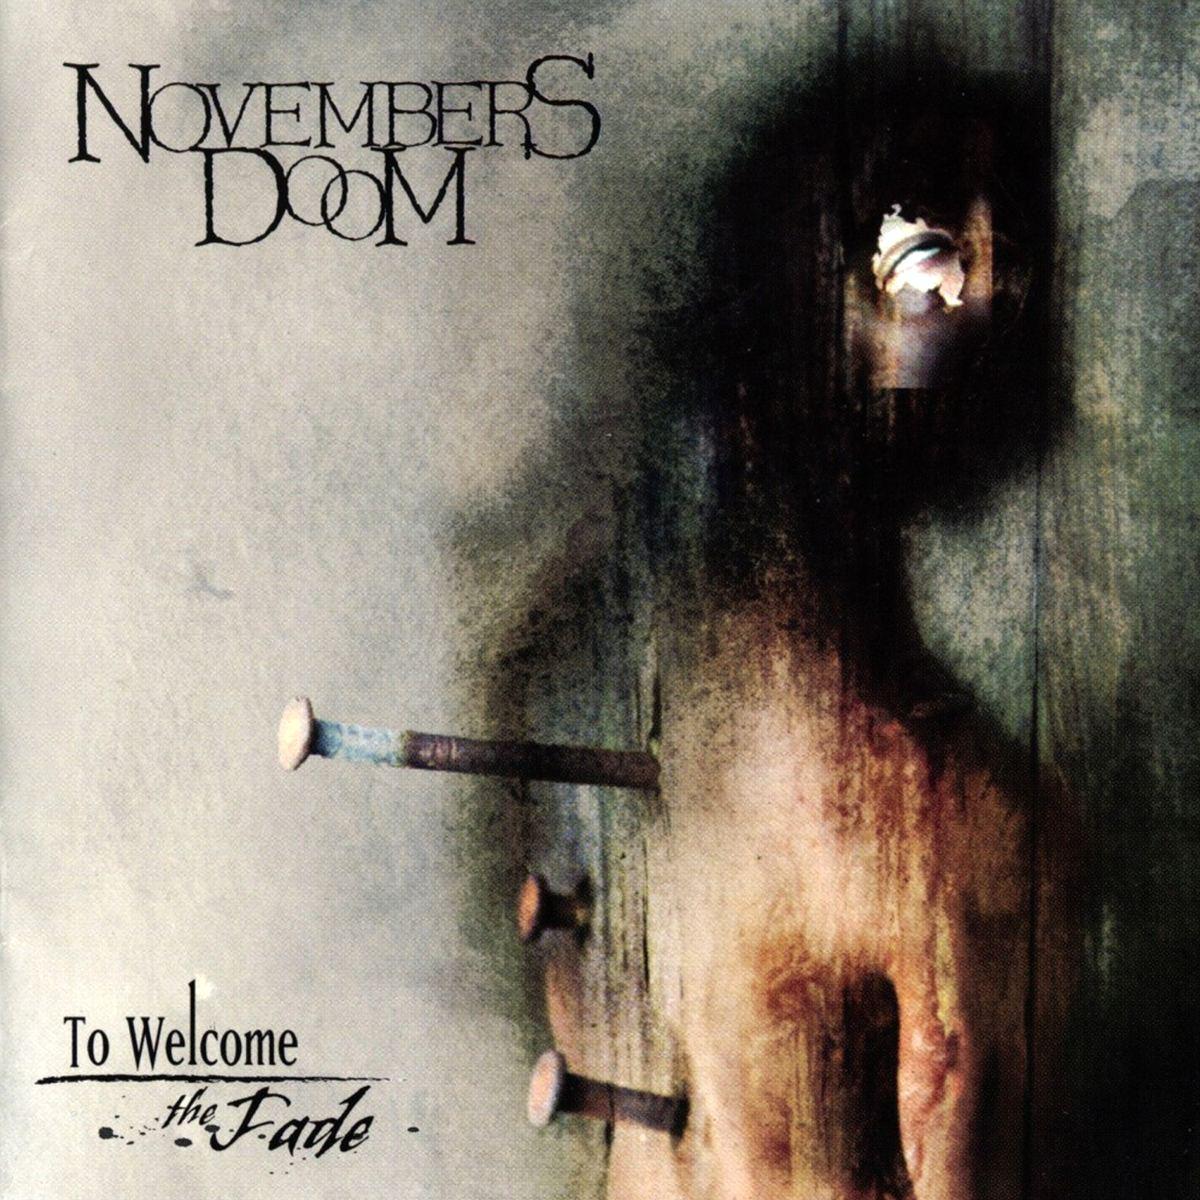 Novembers Doom - To Welcome the Fade